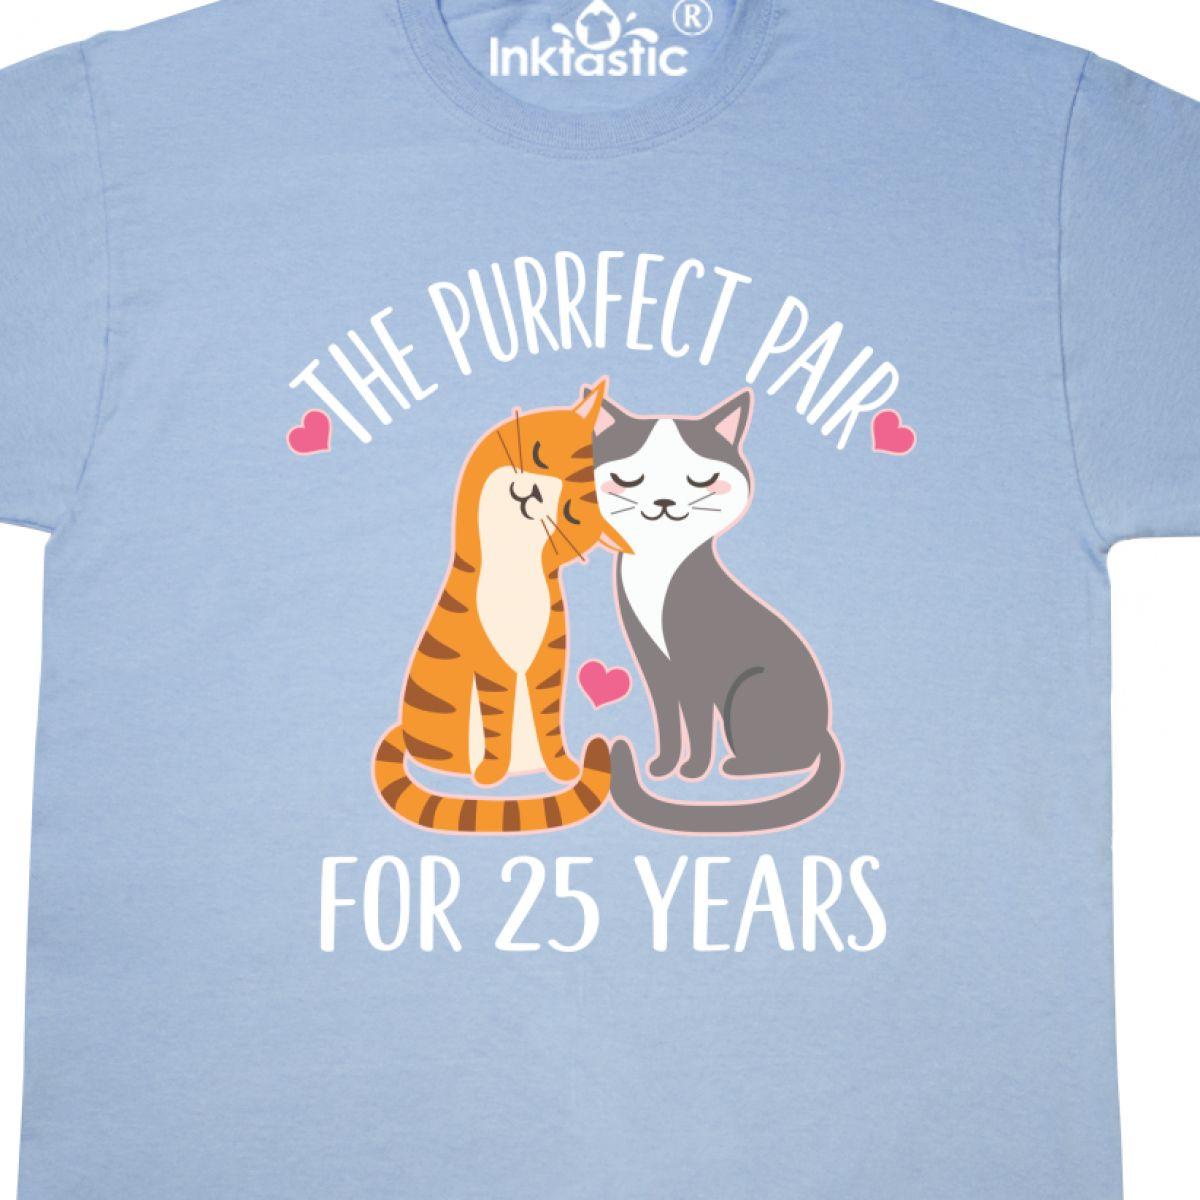 Inktastic 25th Anniversary Gift Cat Couples T-Shirt Wedding Cute Celebration Hws